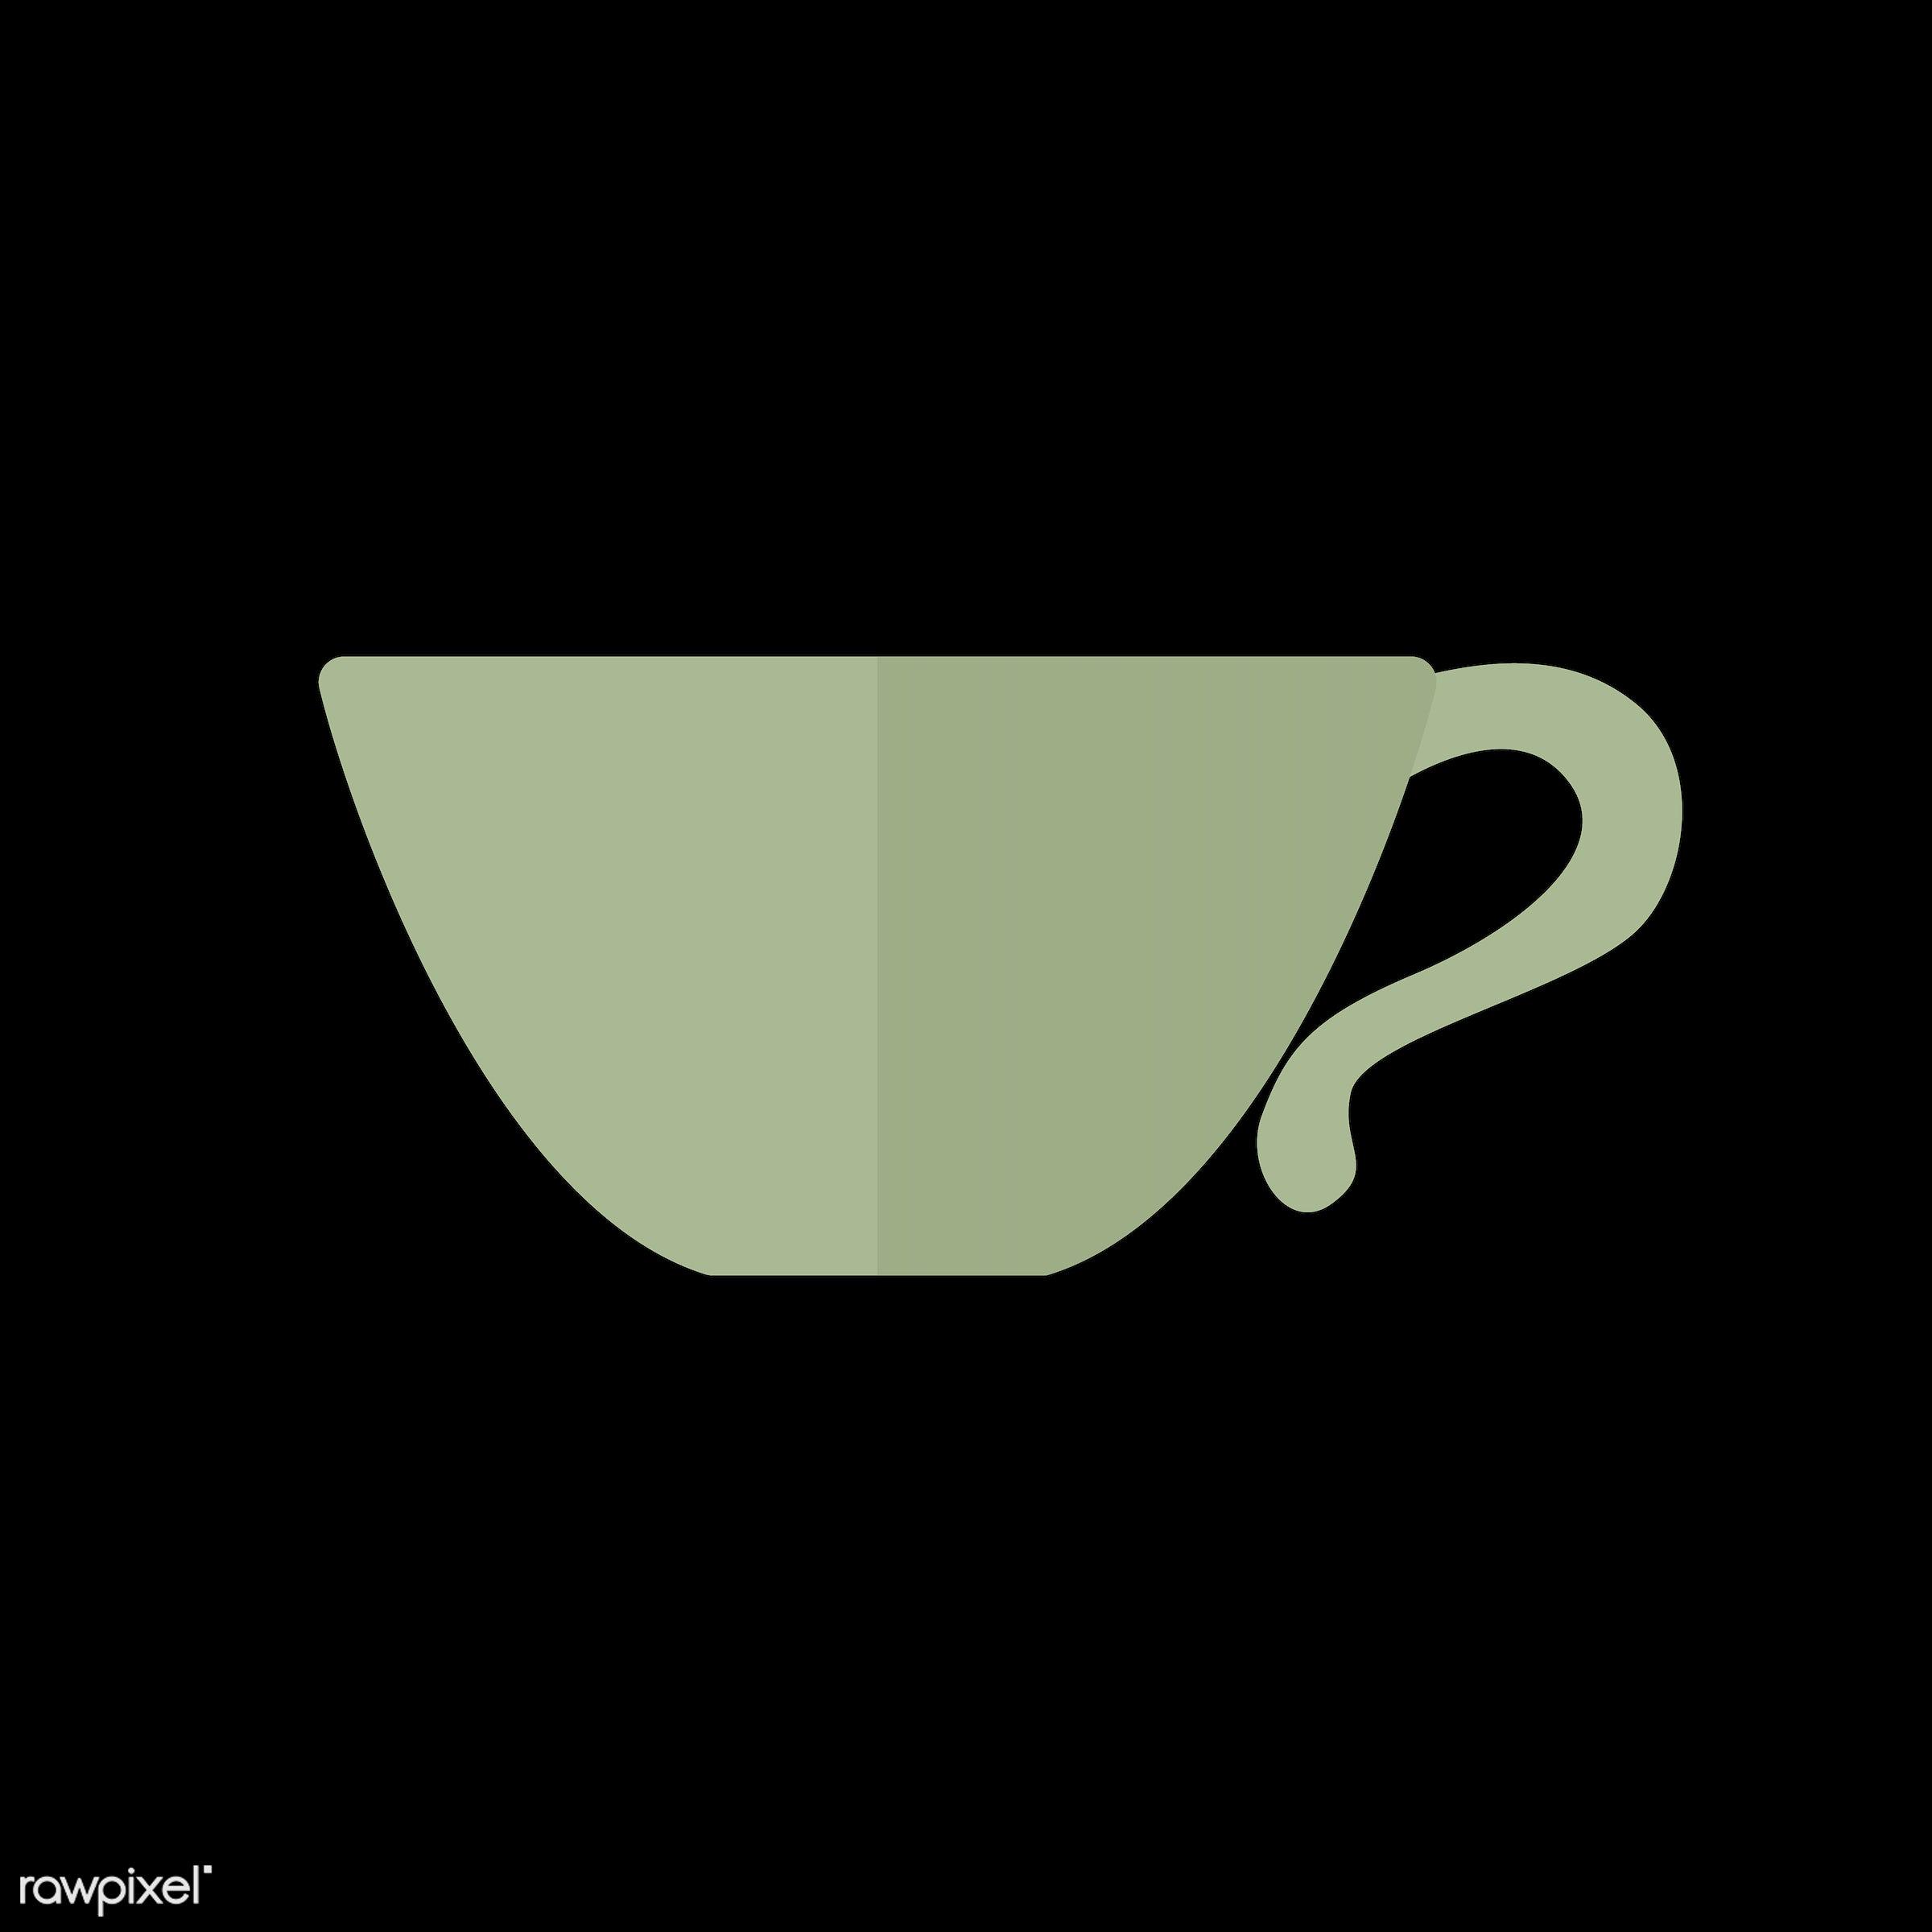 vector, graphic, illustration, icon, symbol, colorful, cute, mug, tea, tea cup, hot drink, drink, beverage, water, coffee,...